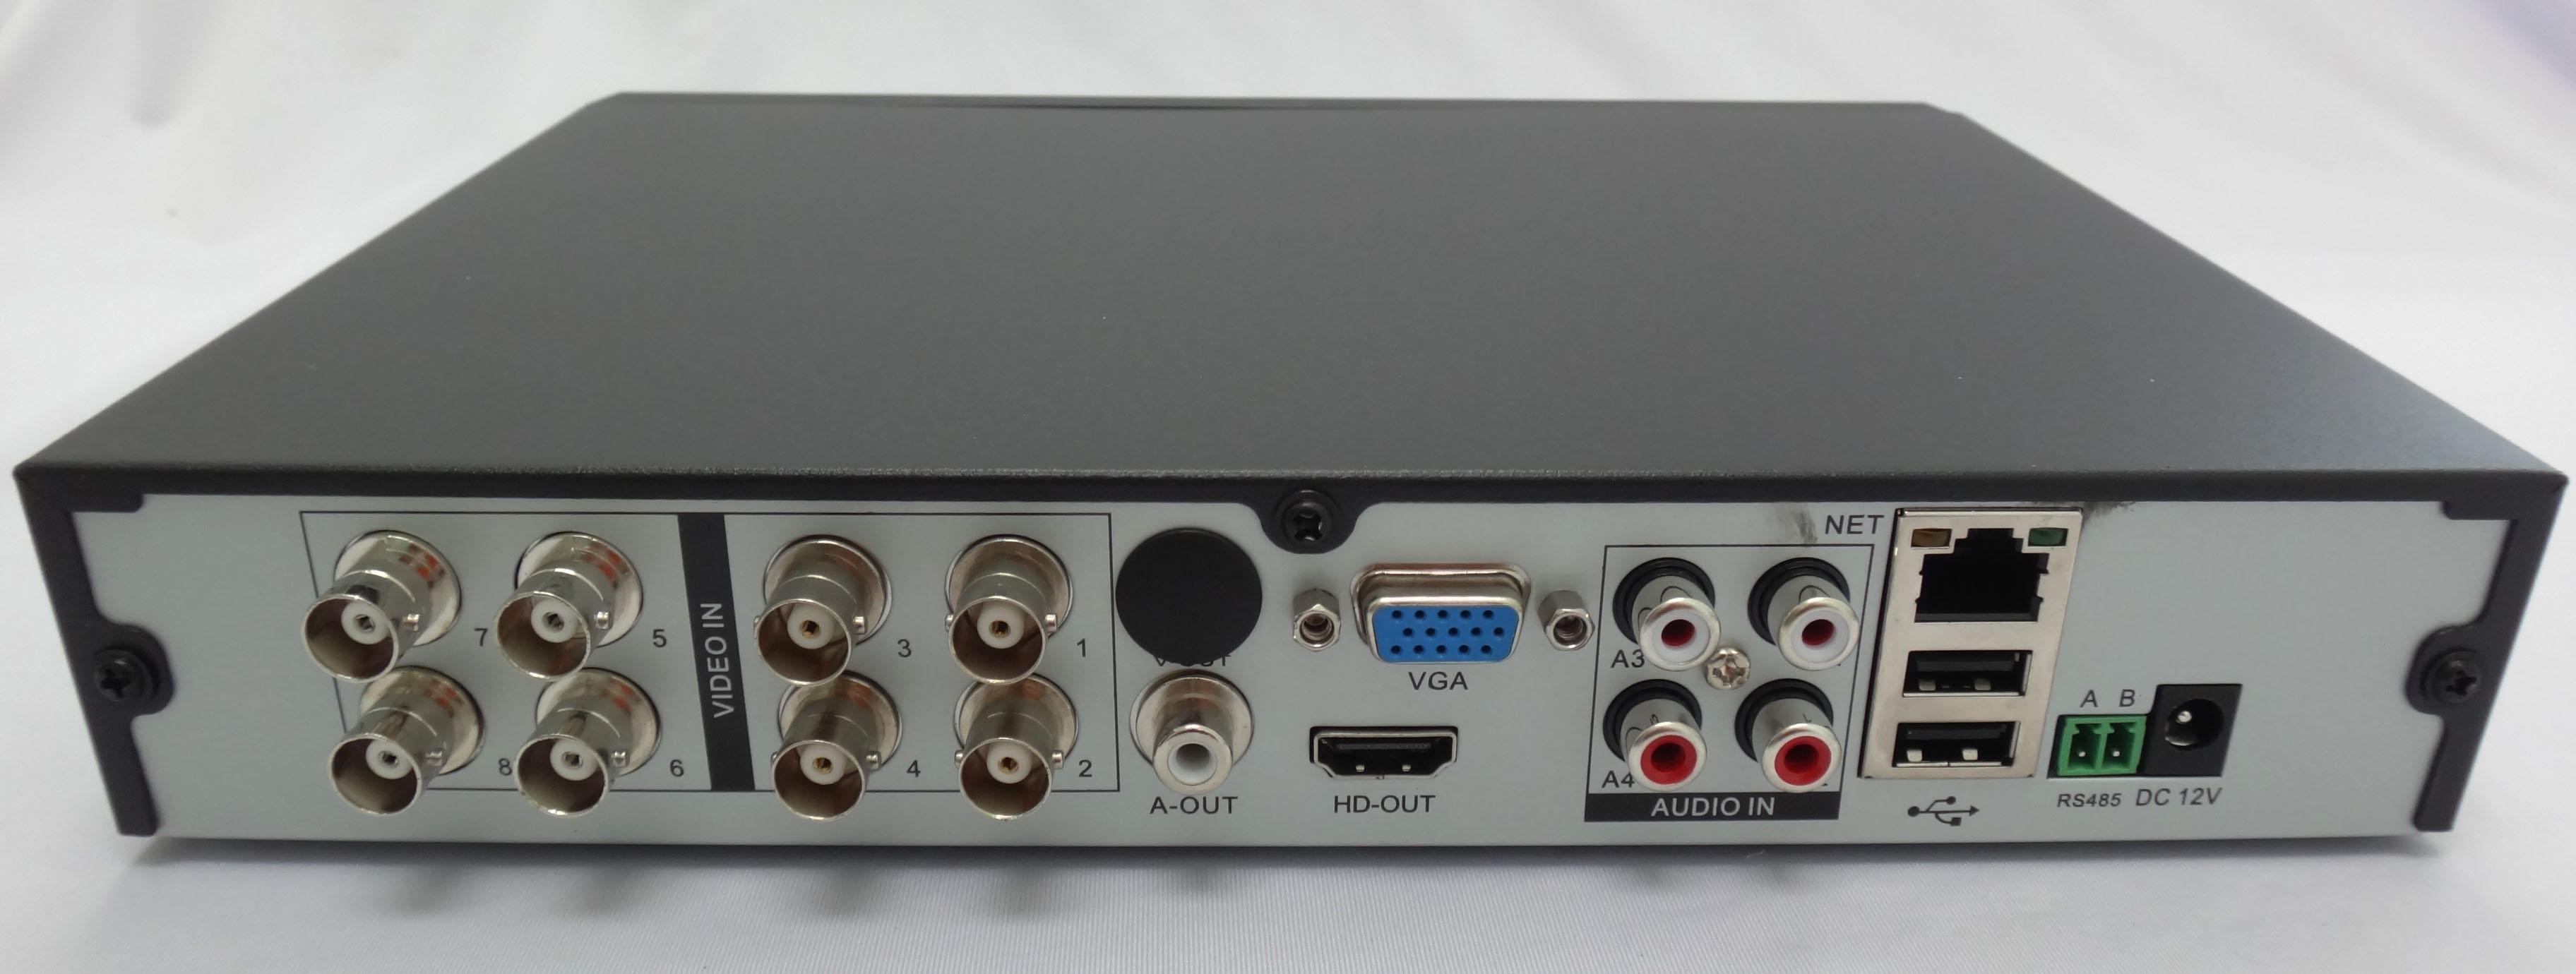 DVR 8 D1 3.jpg